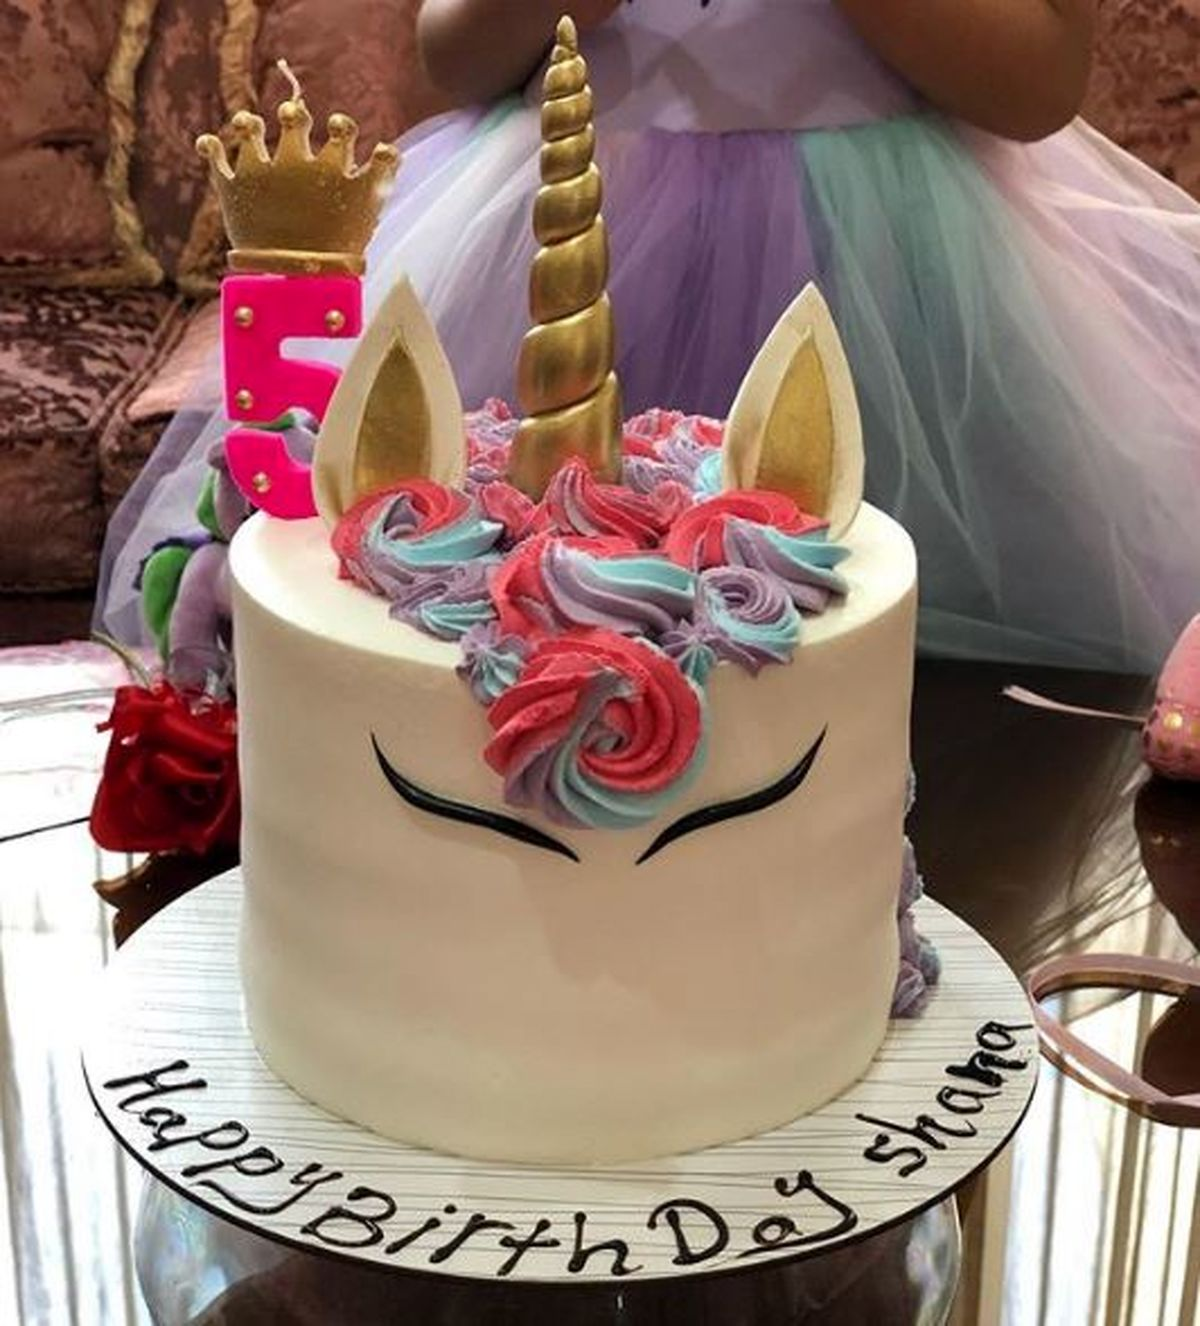 کیک تولد دختر شبنم قلیخانی + عکس